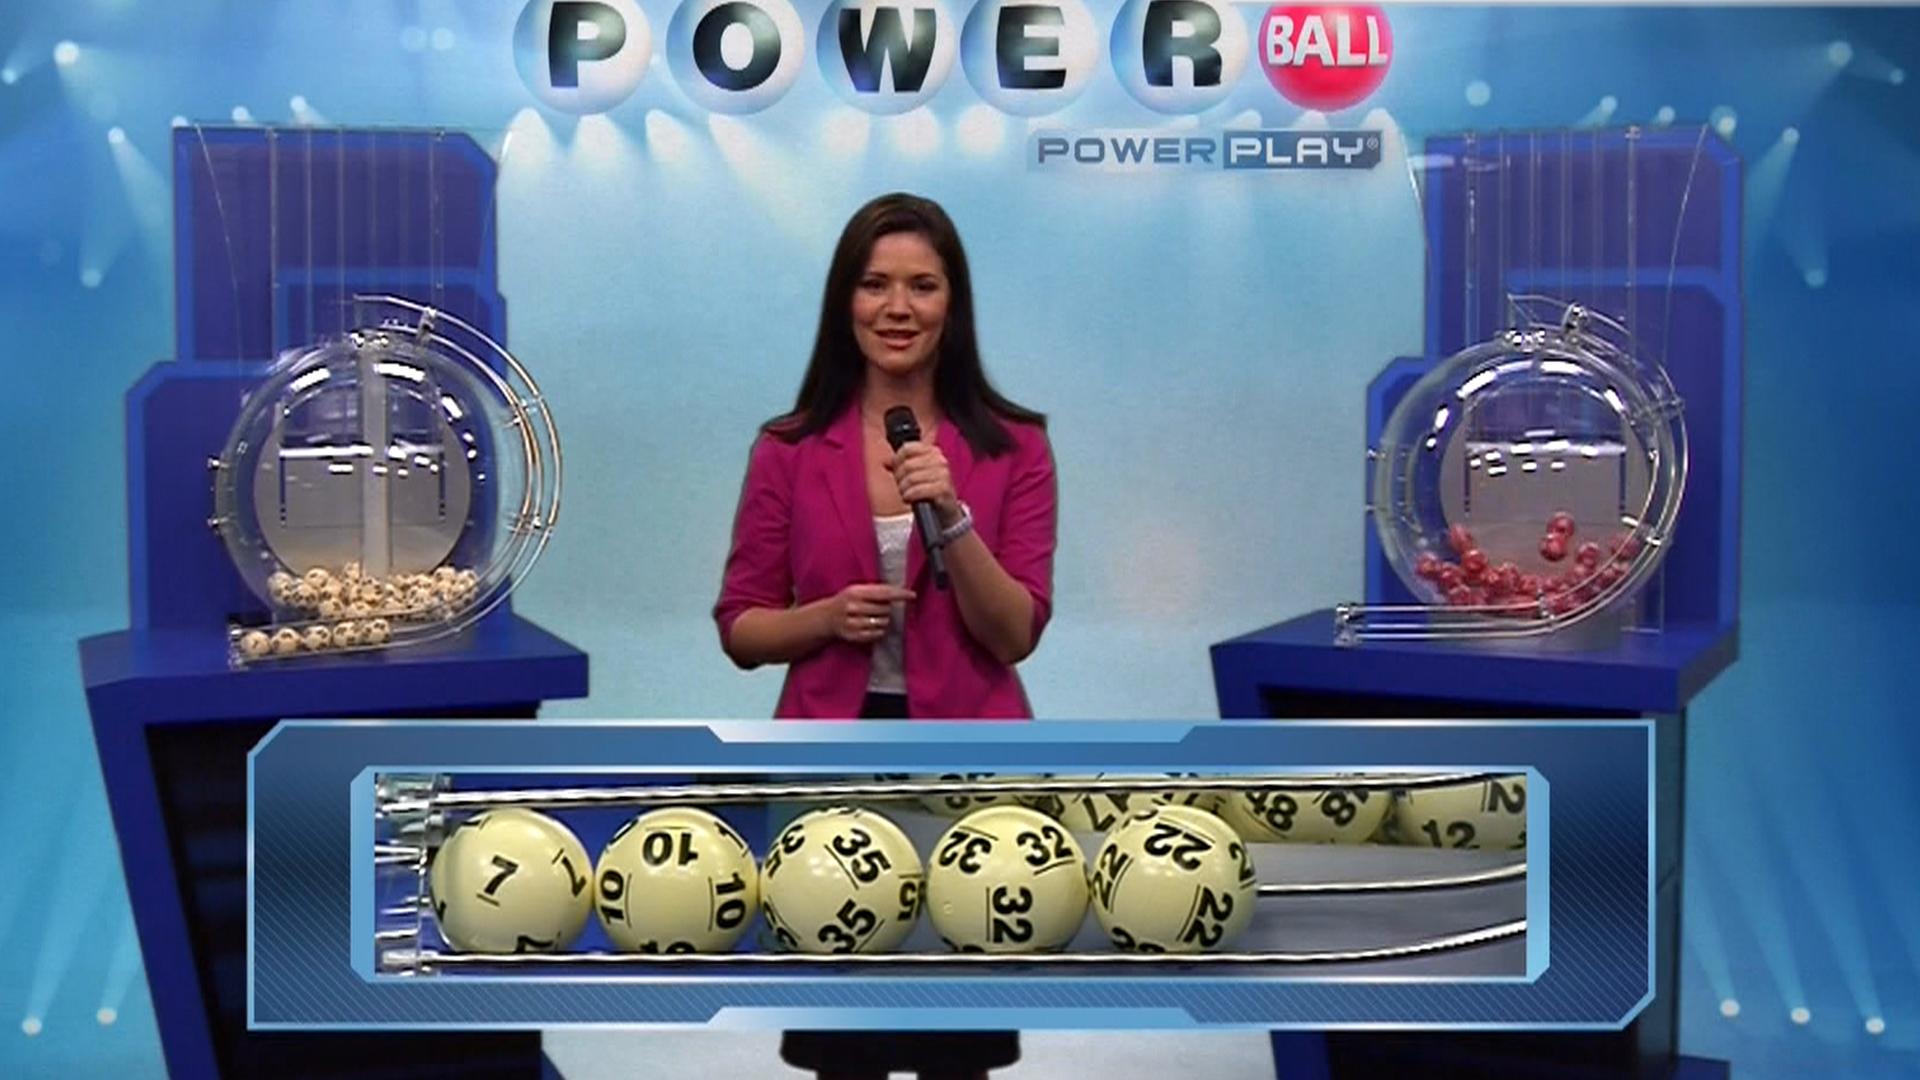 Lottery winning 101: First get a lawyer and a tax expert - NBC News